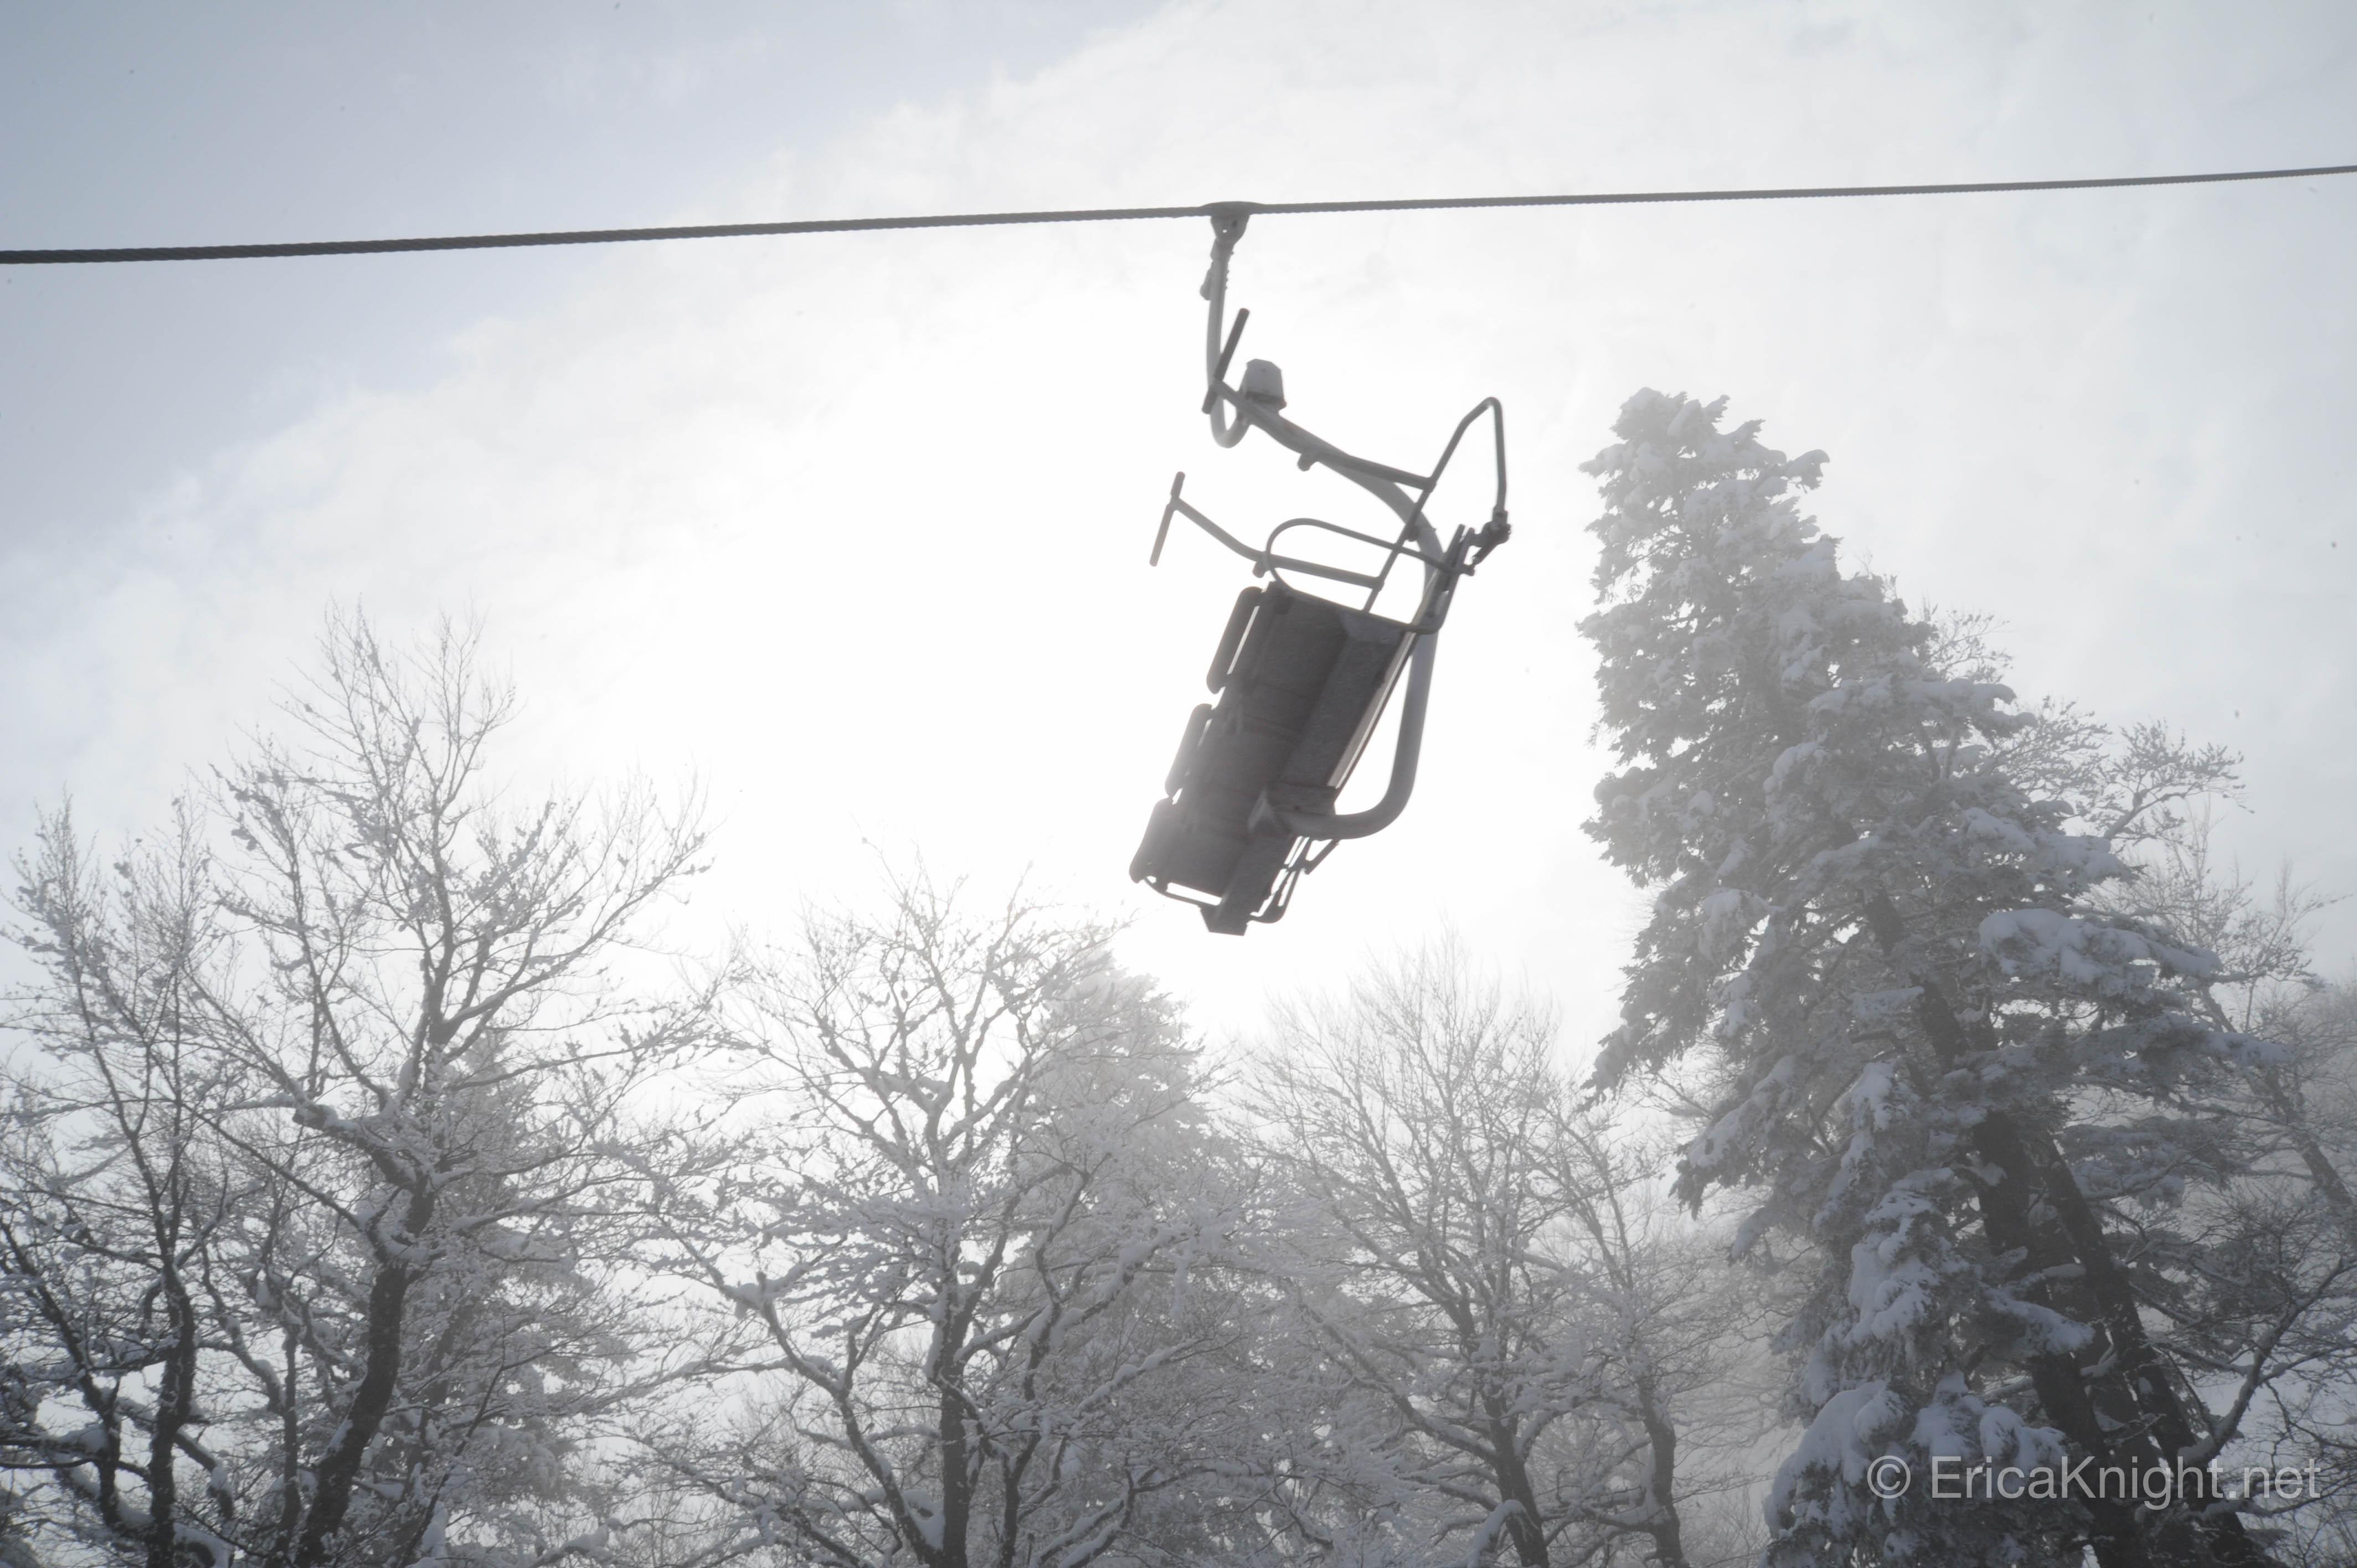 Frozen Ski Lift - Sarajevo, Bosnia